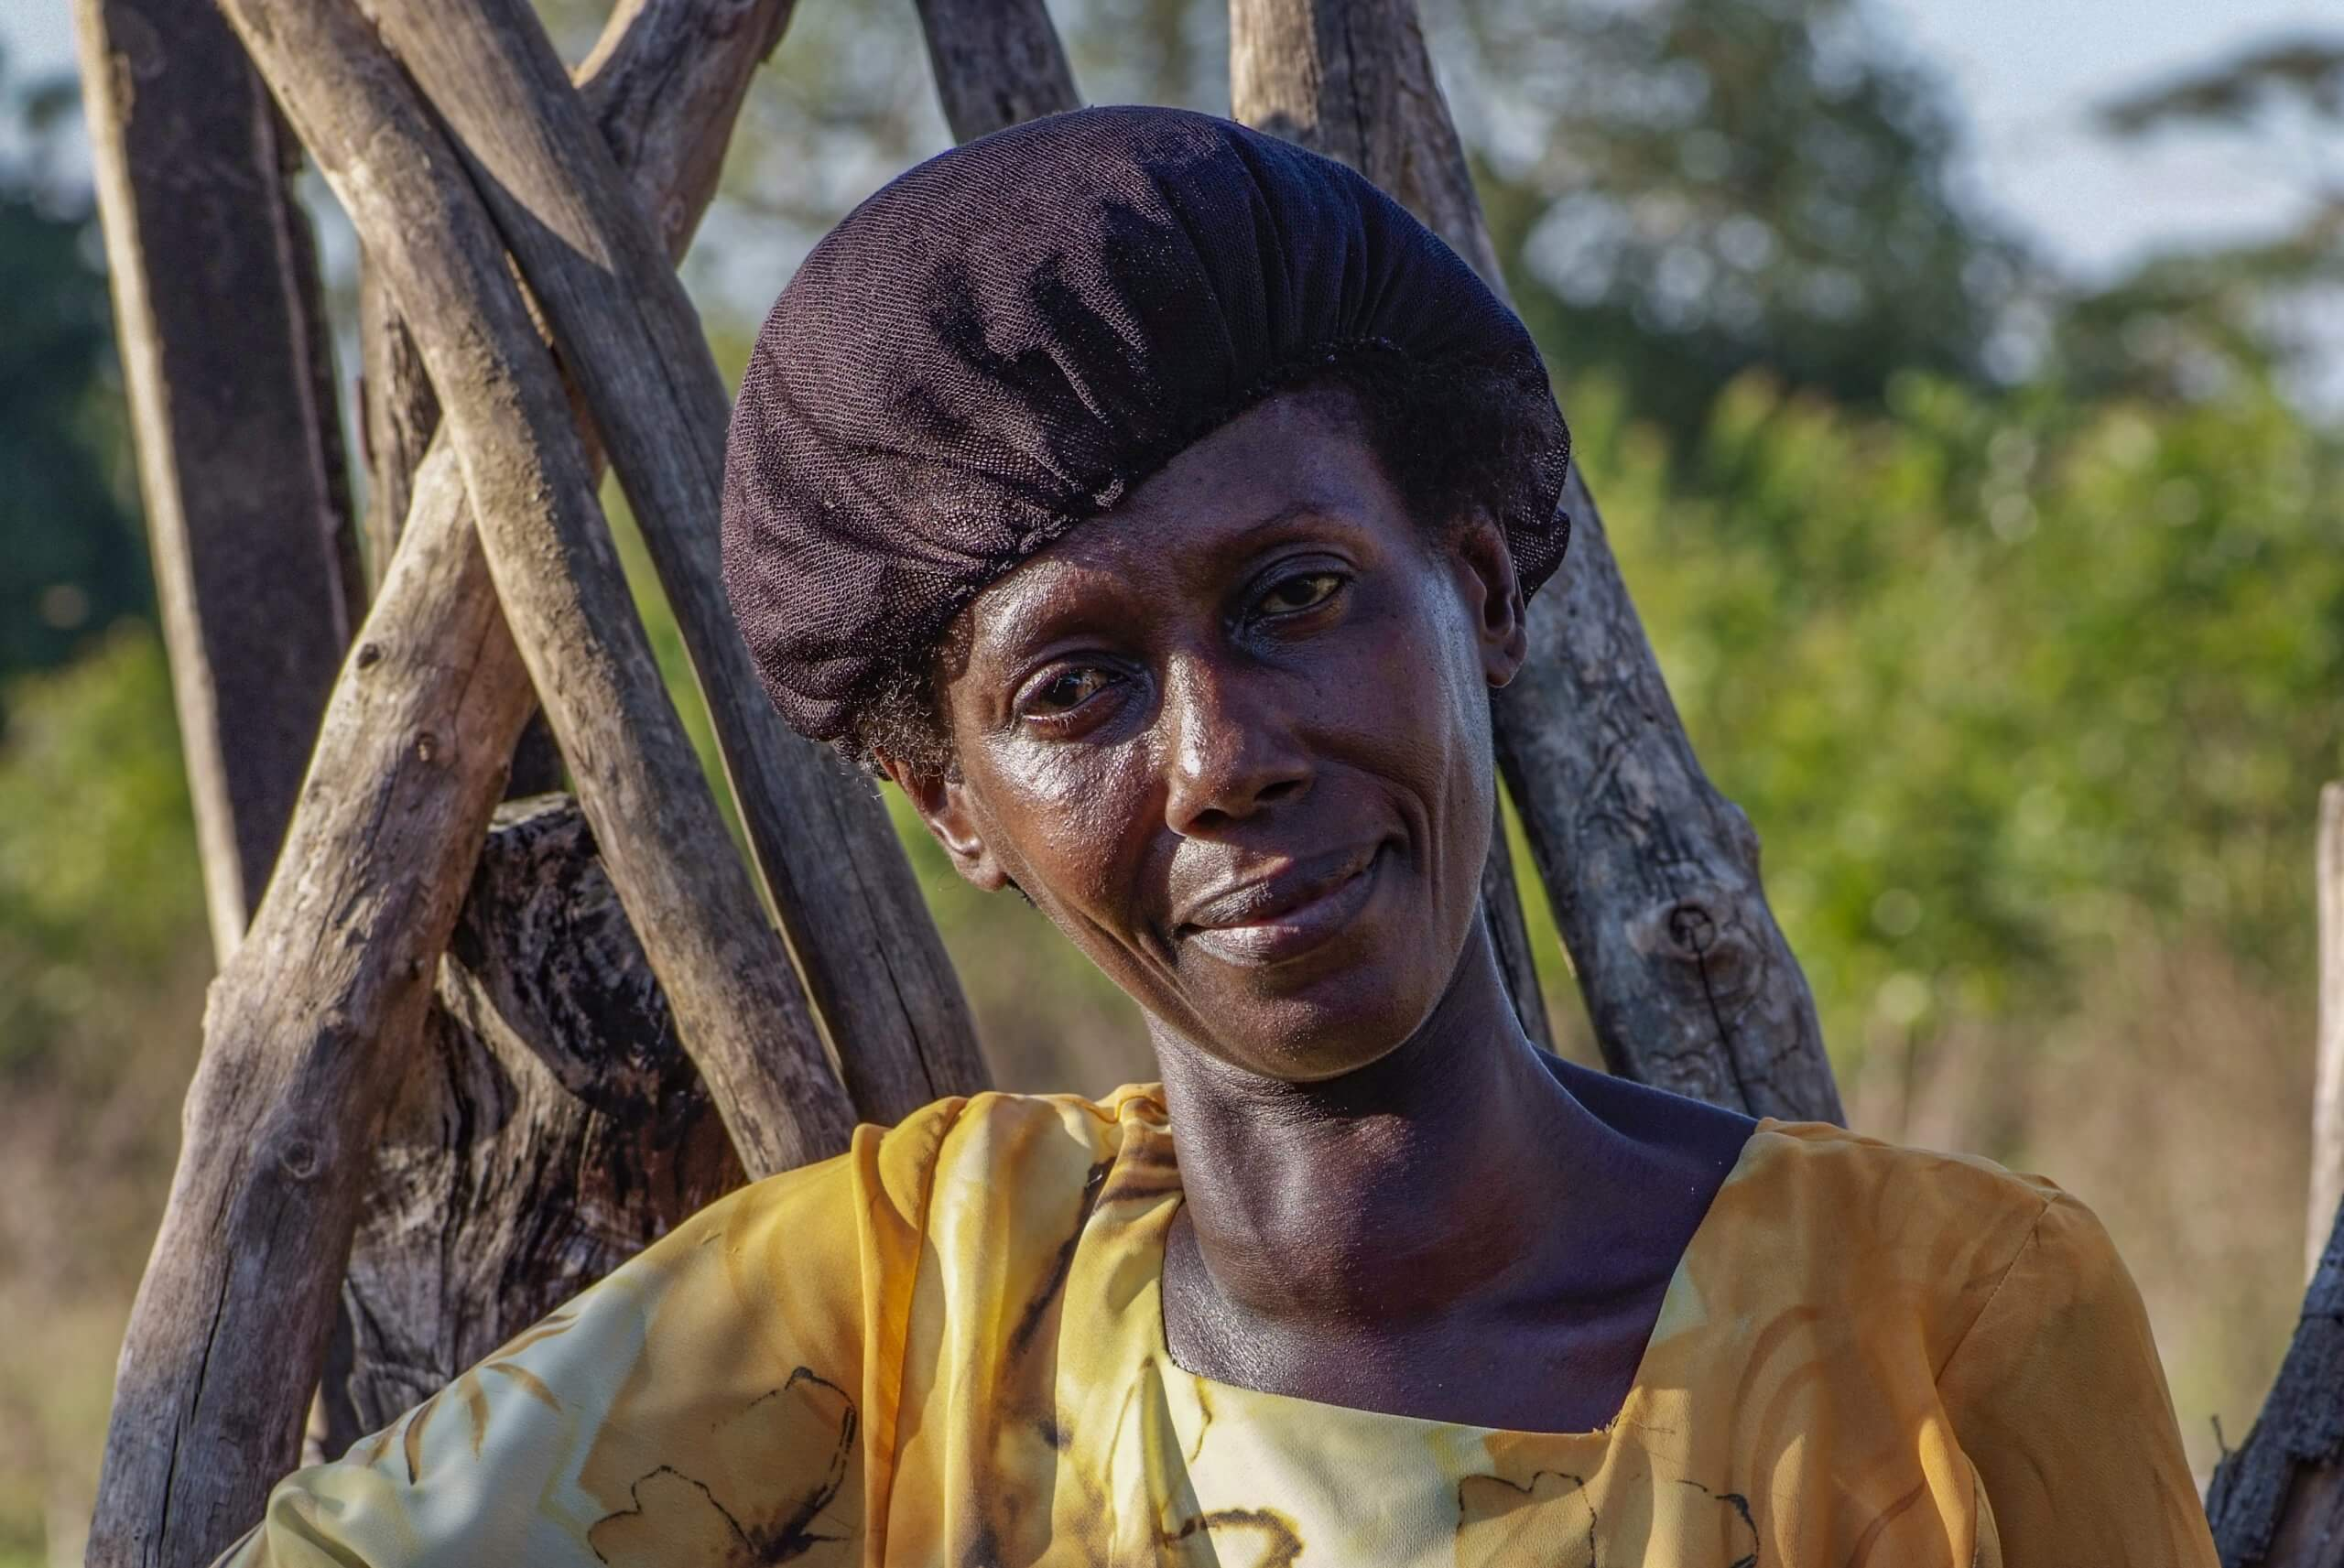 11 02 boerin trotsevrouwen Florence C Mokiwa Tanga Tanzania 4033 scaled